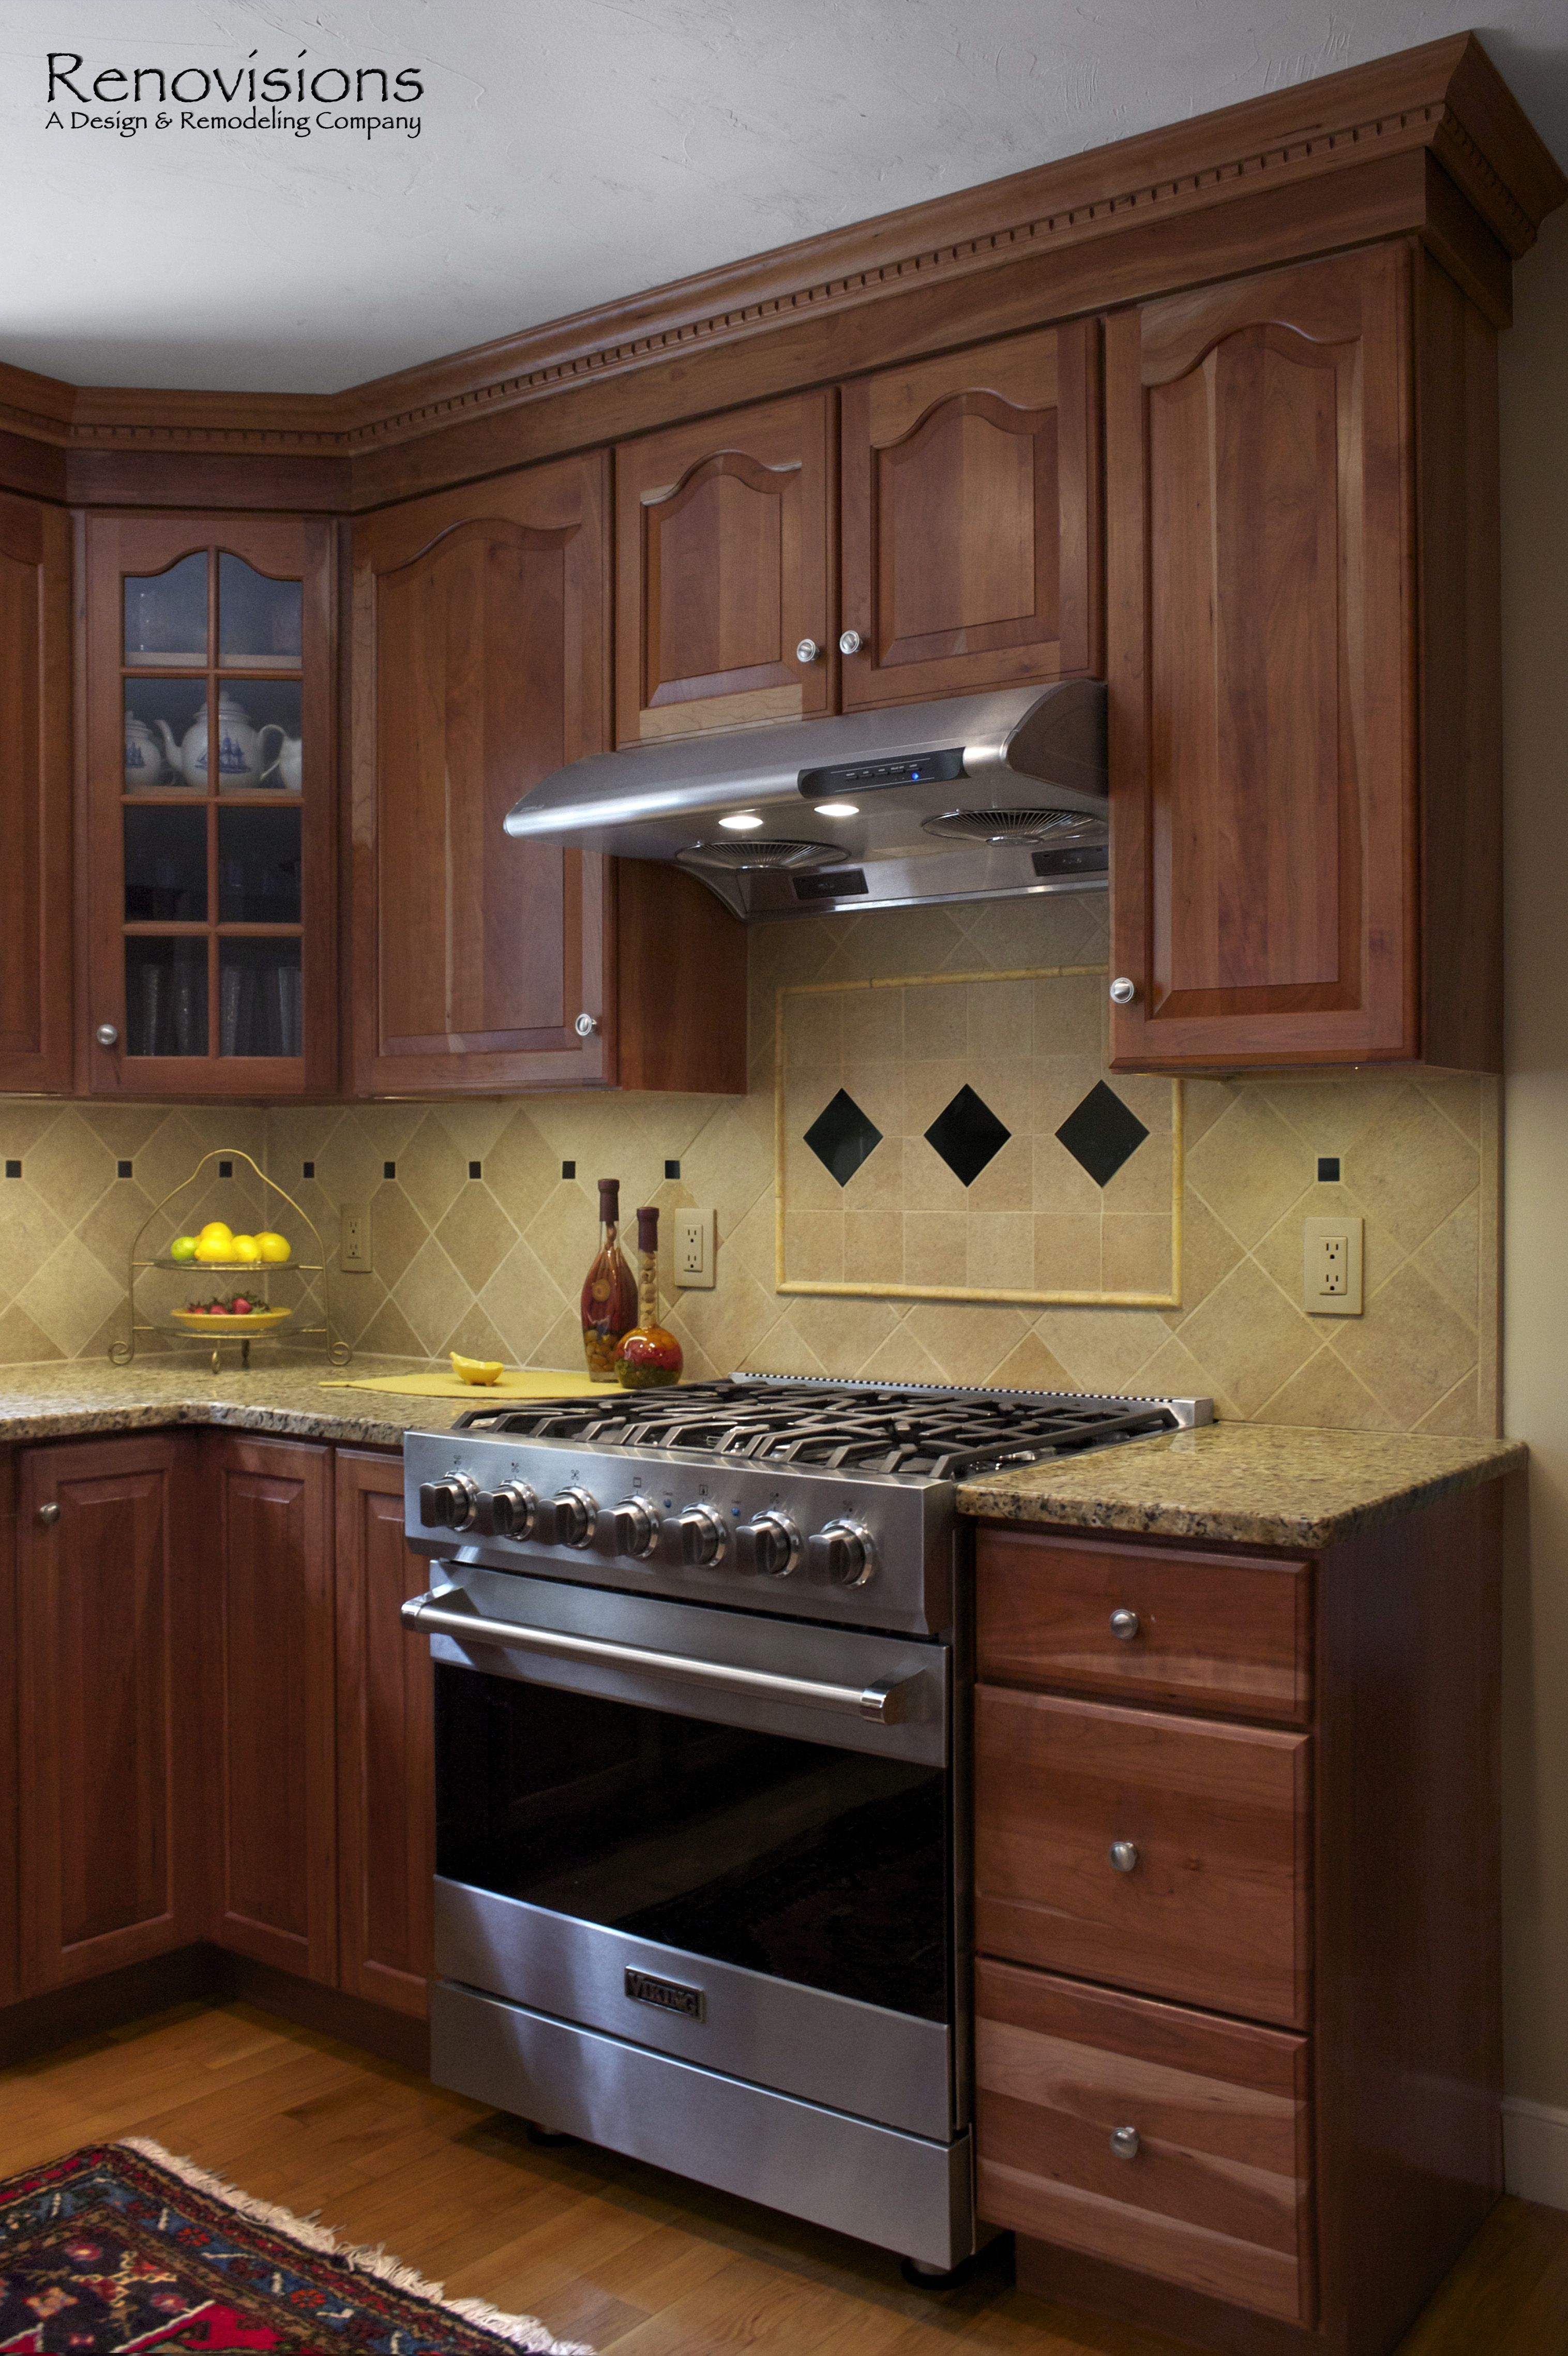 backsplash pictures for granite countertops. Decorative Tan And Black Tile Backsplash. Granite Countertops Natural Cherry Cabinets With Under Cabinet Lights. Stainless Steel Appliances. Backsplash Pictures For